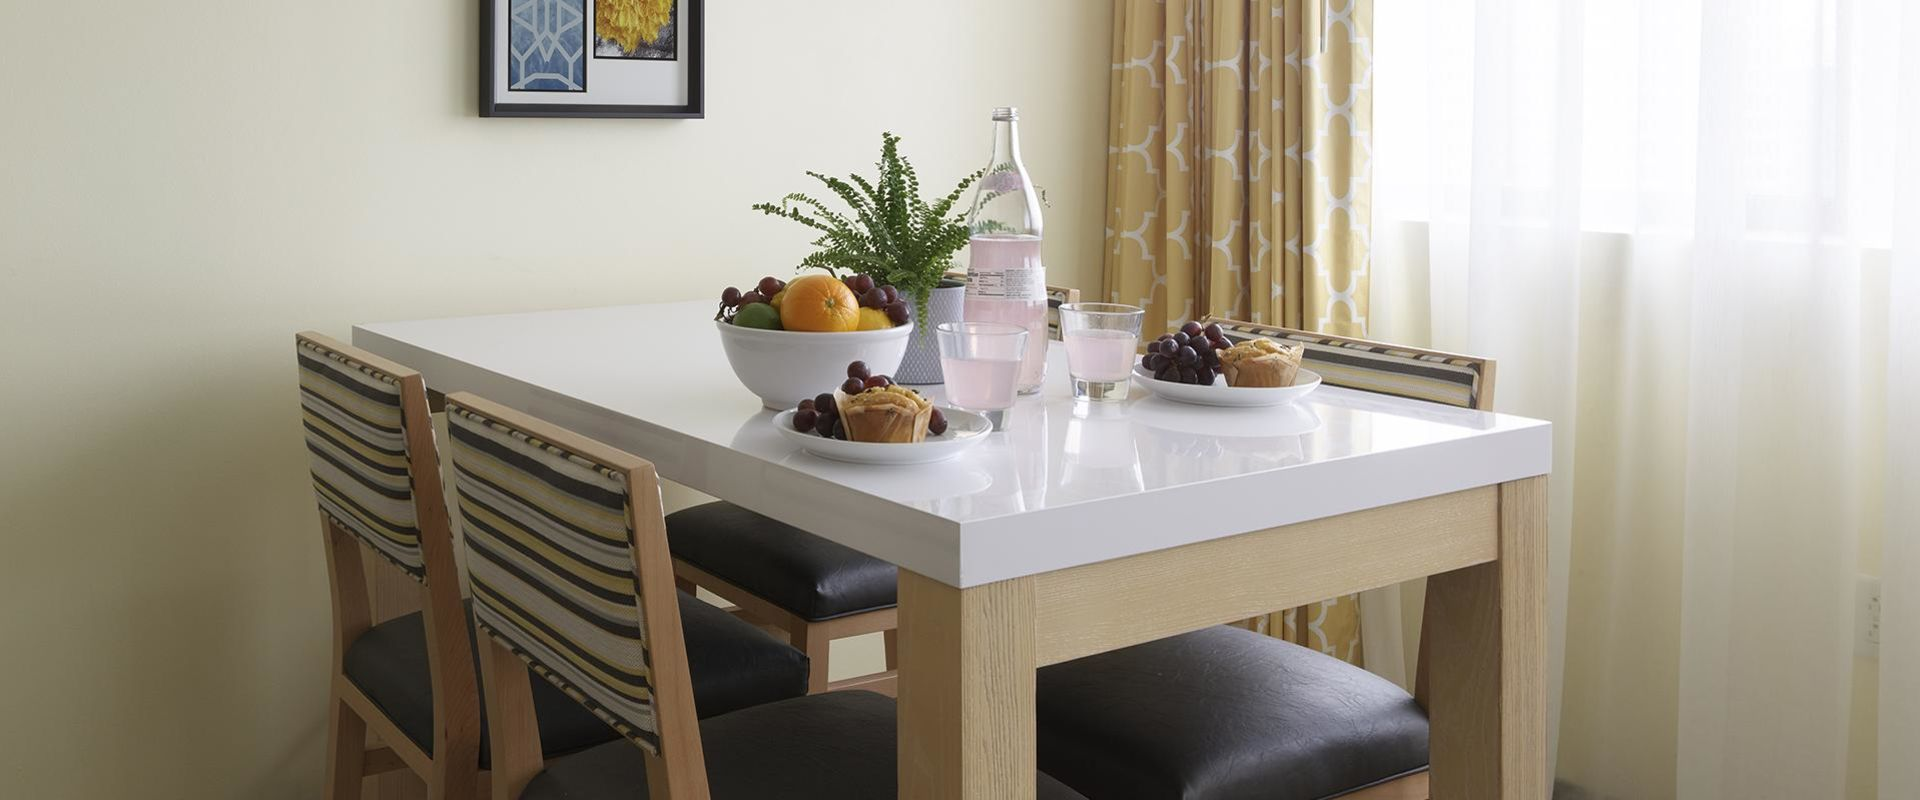 New Orleans ES kitchen table